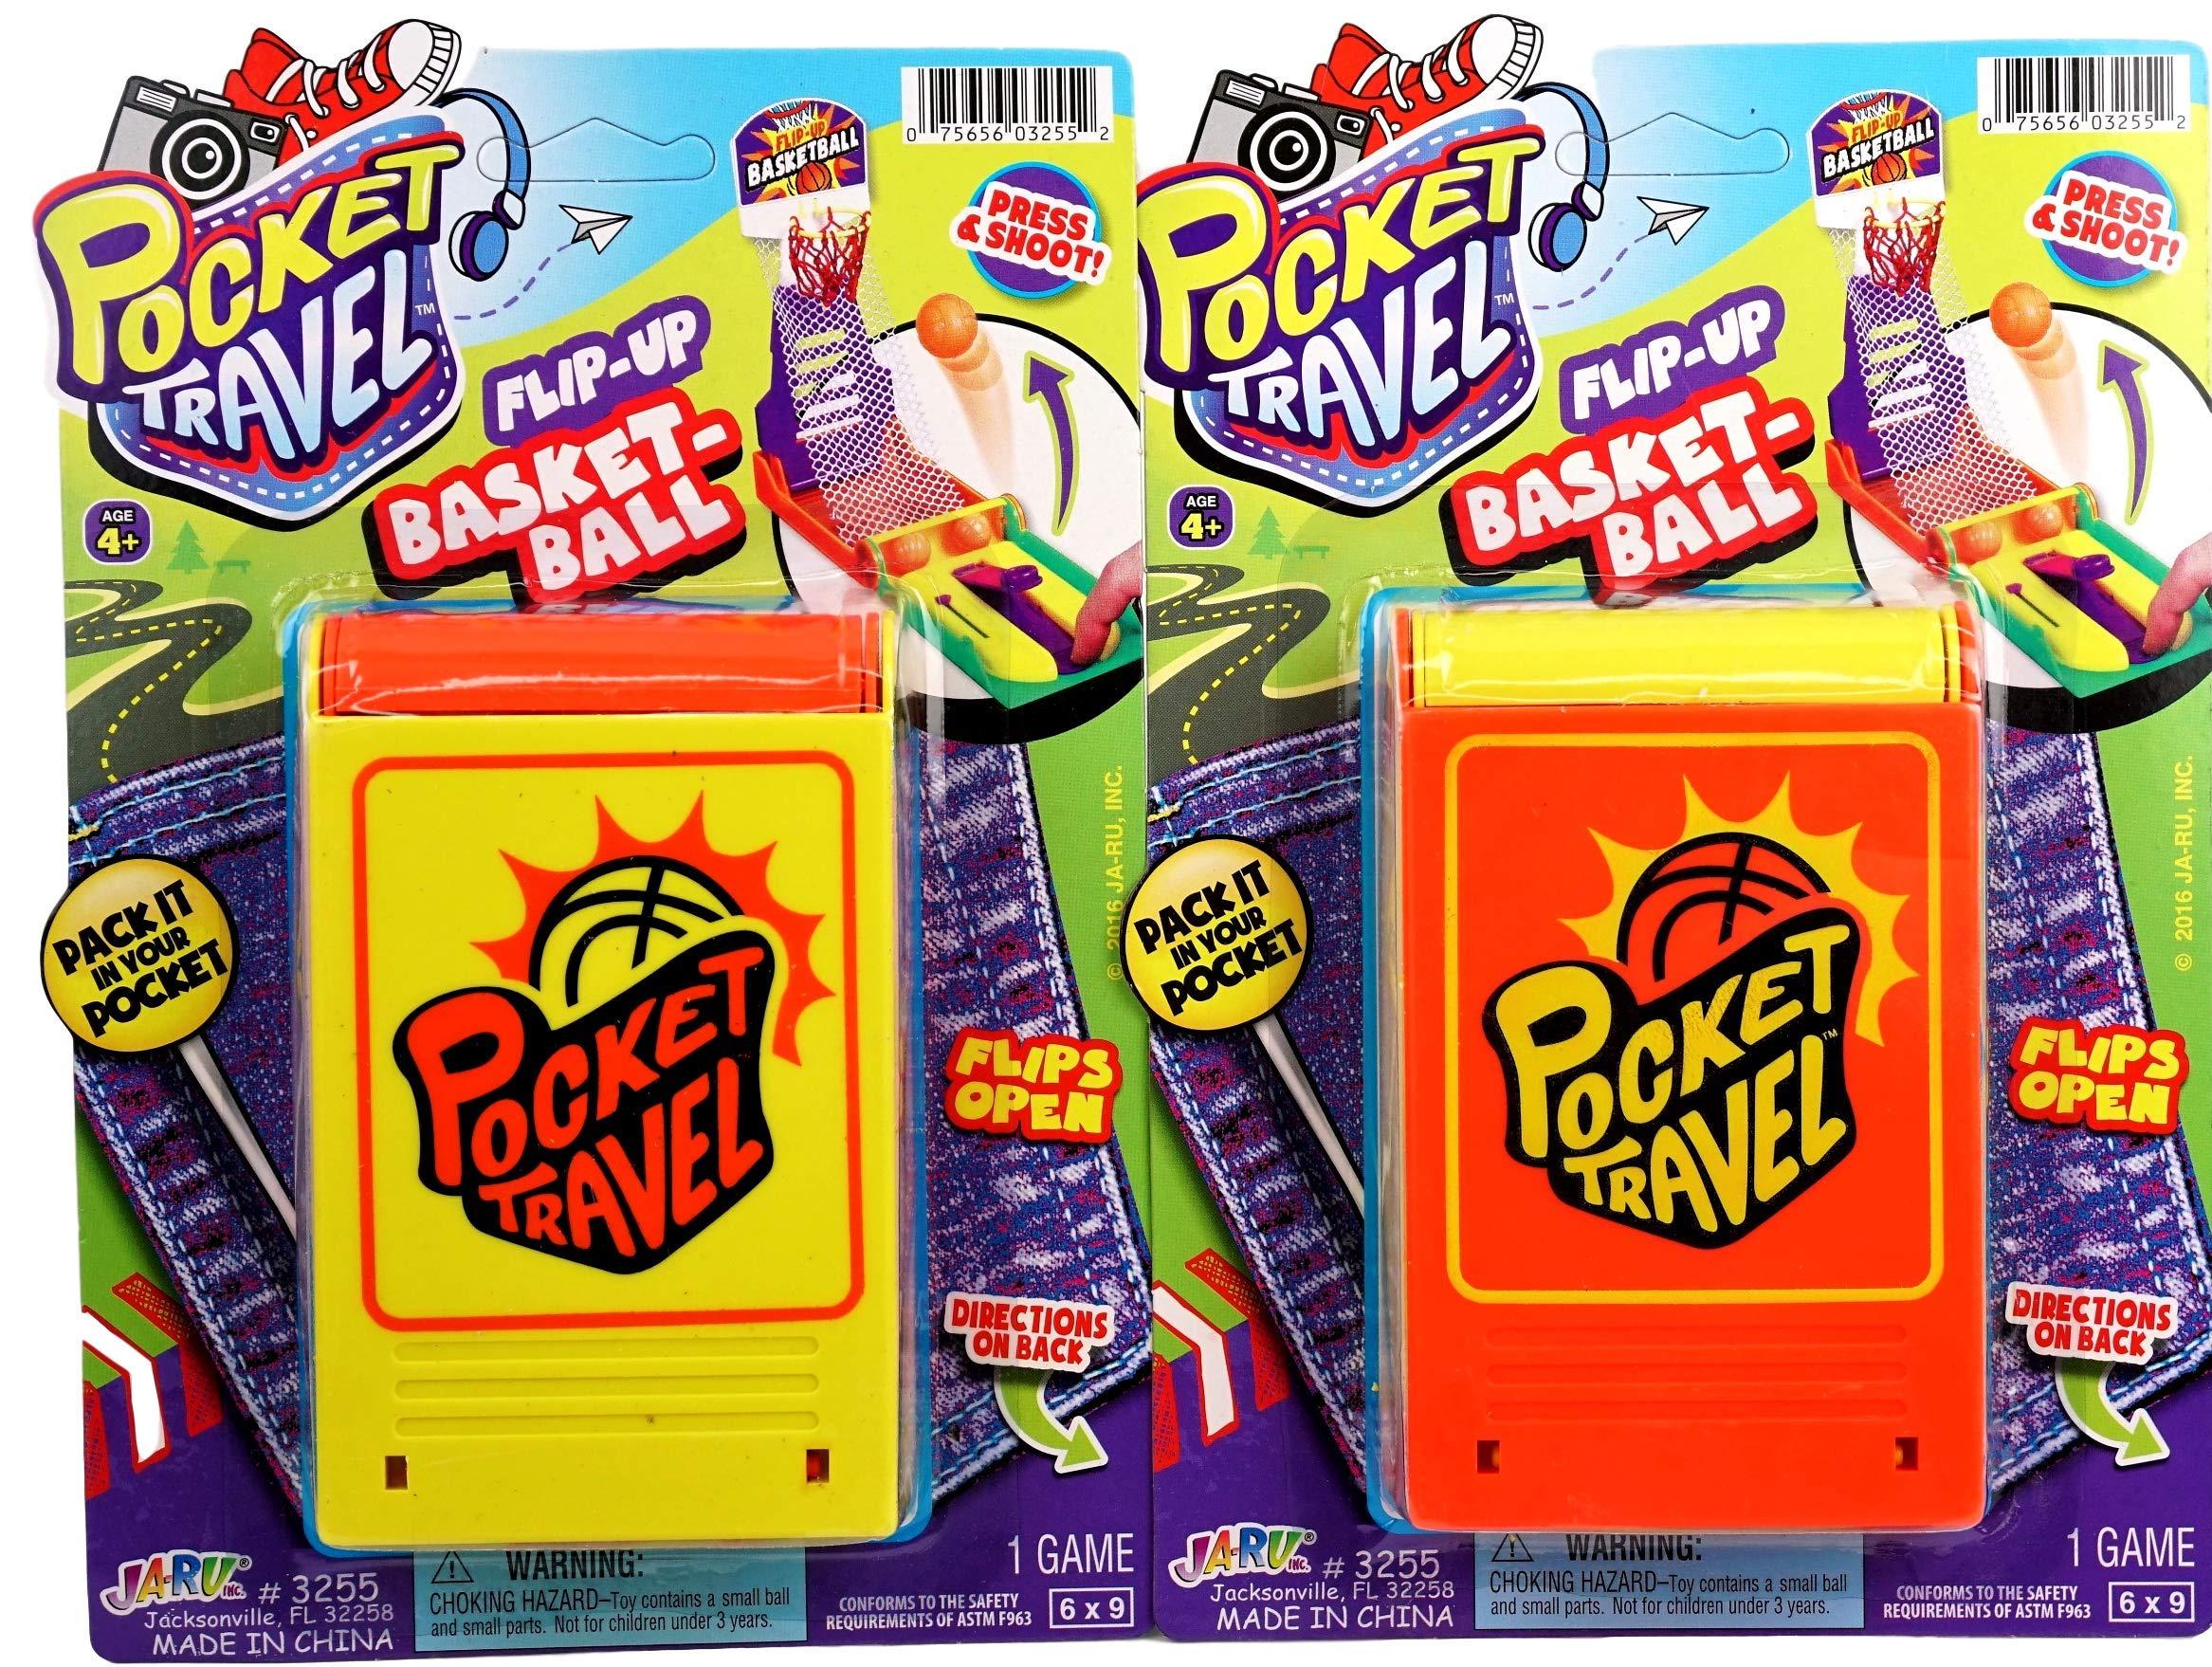 JA-RU Basketball Pocket Travel Game (144 Units) and one Bouncy Ball Item #3255-144p by JA-RU (Image #2)